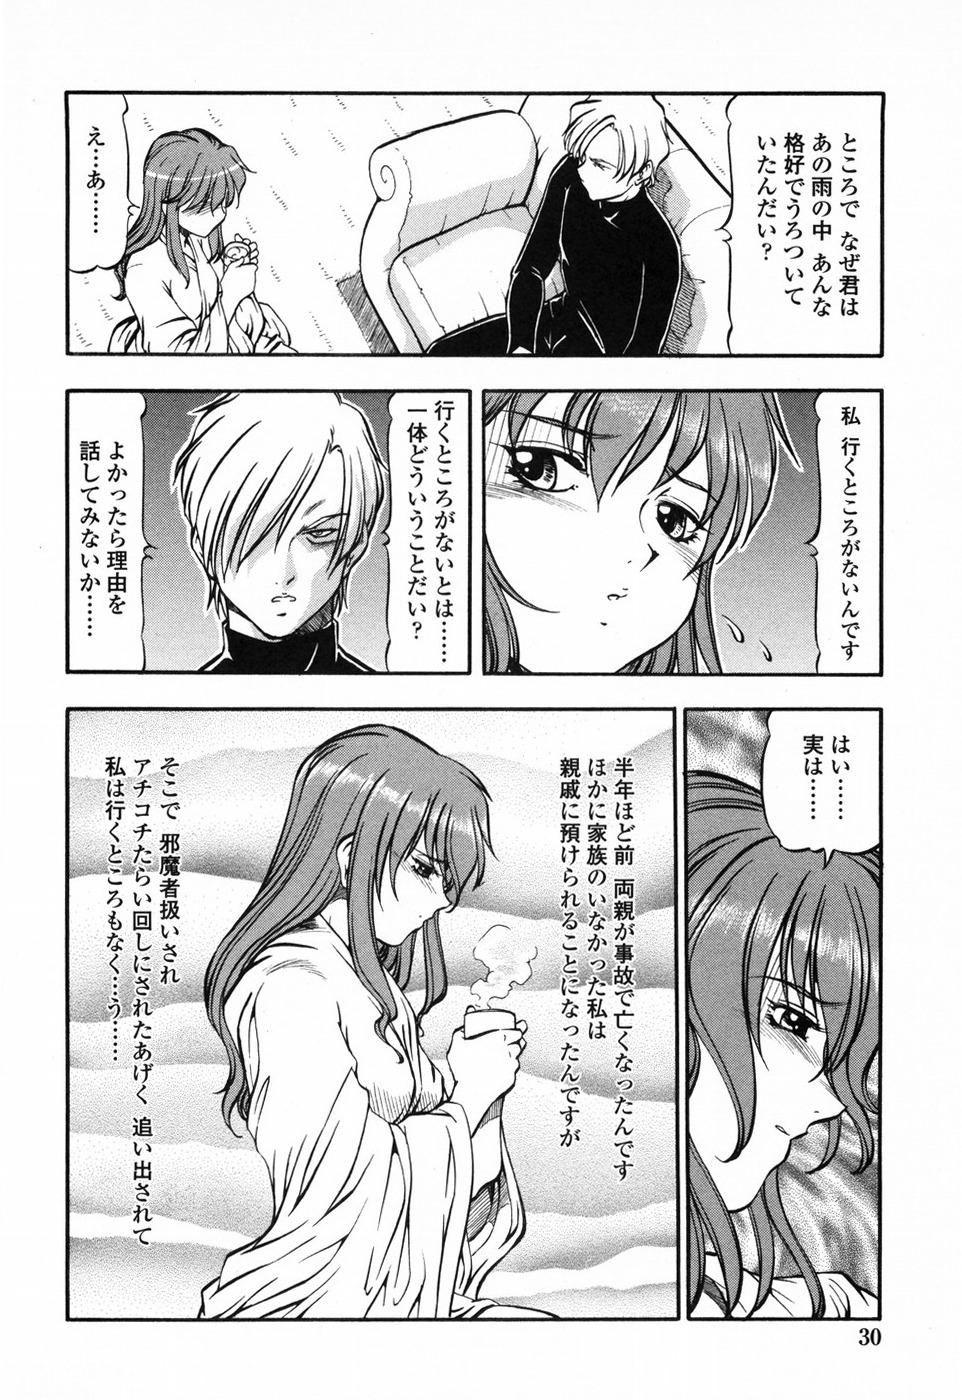 Kichiku Houteishiki - Equation of brutal person 35